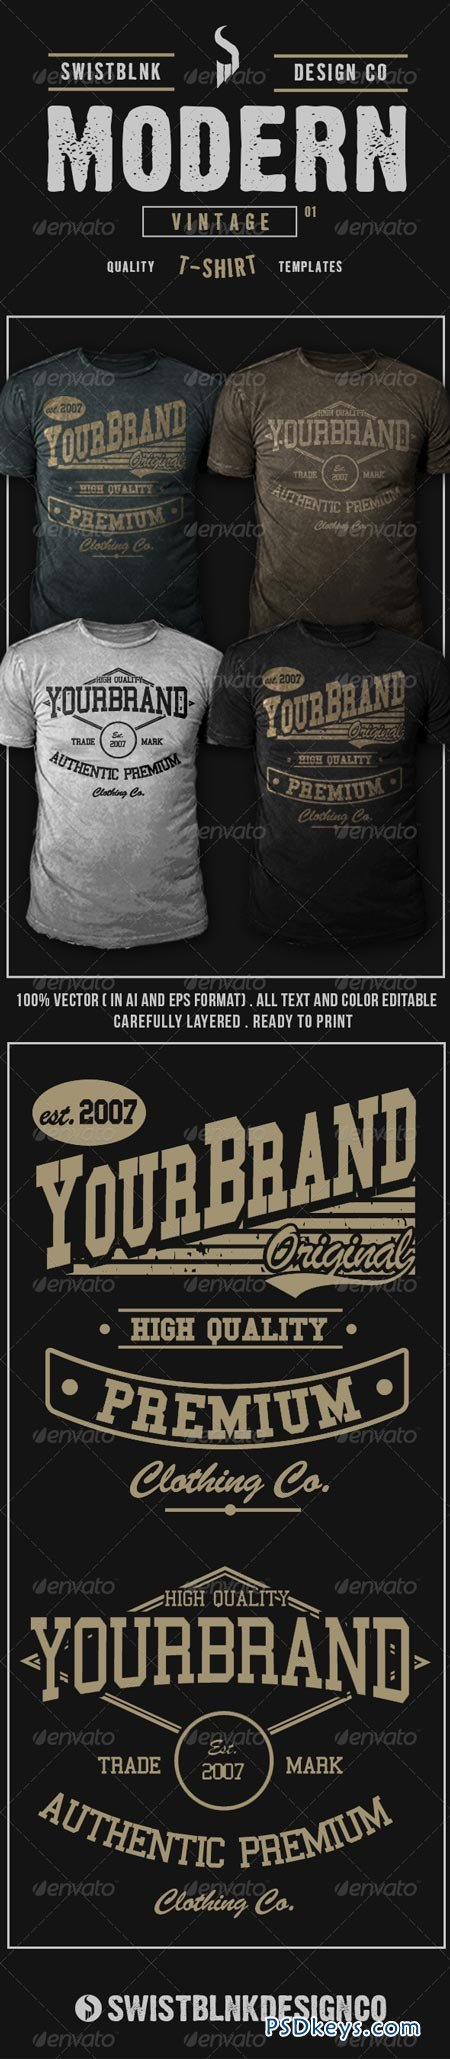 T shirt design 7 25xeps - T Shirt Design 7 25xeps Modern Vintage T Shirt 01 6594379